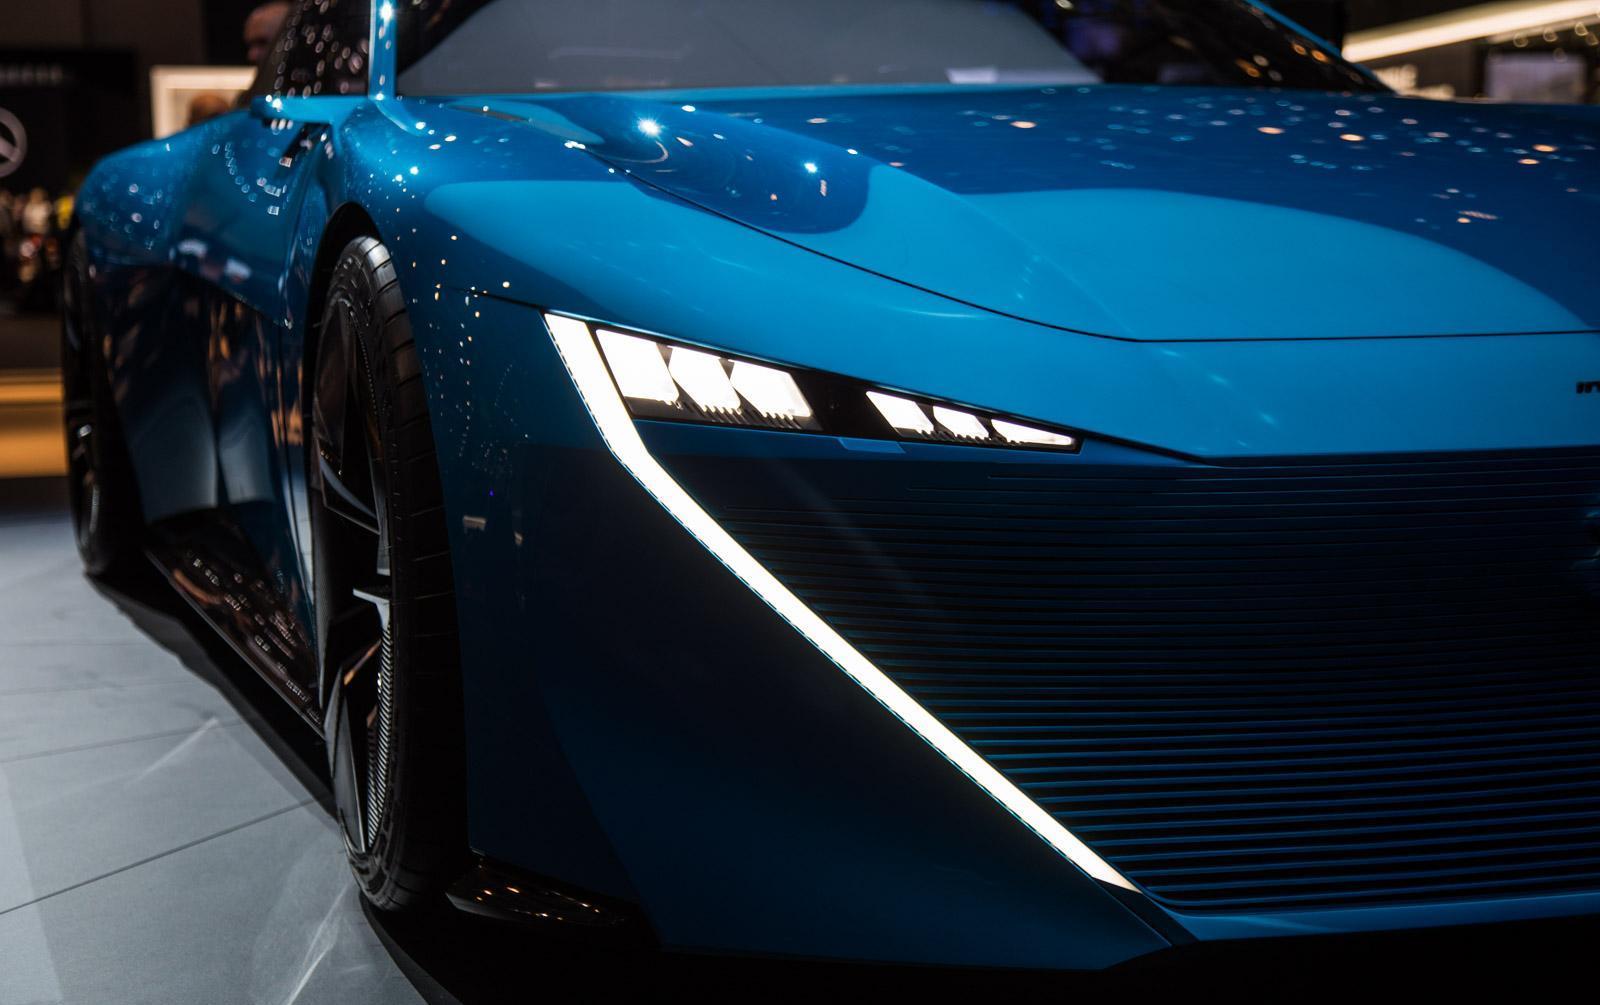 Peugeot-instinct-concept-005